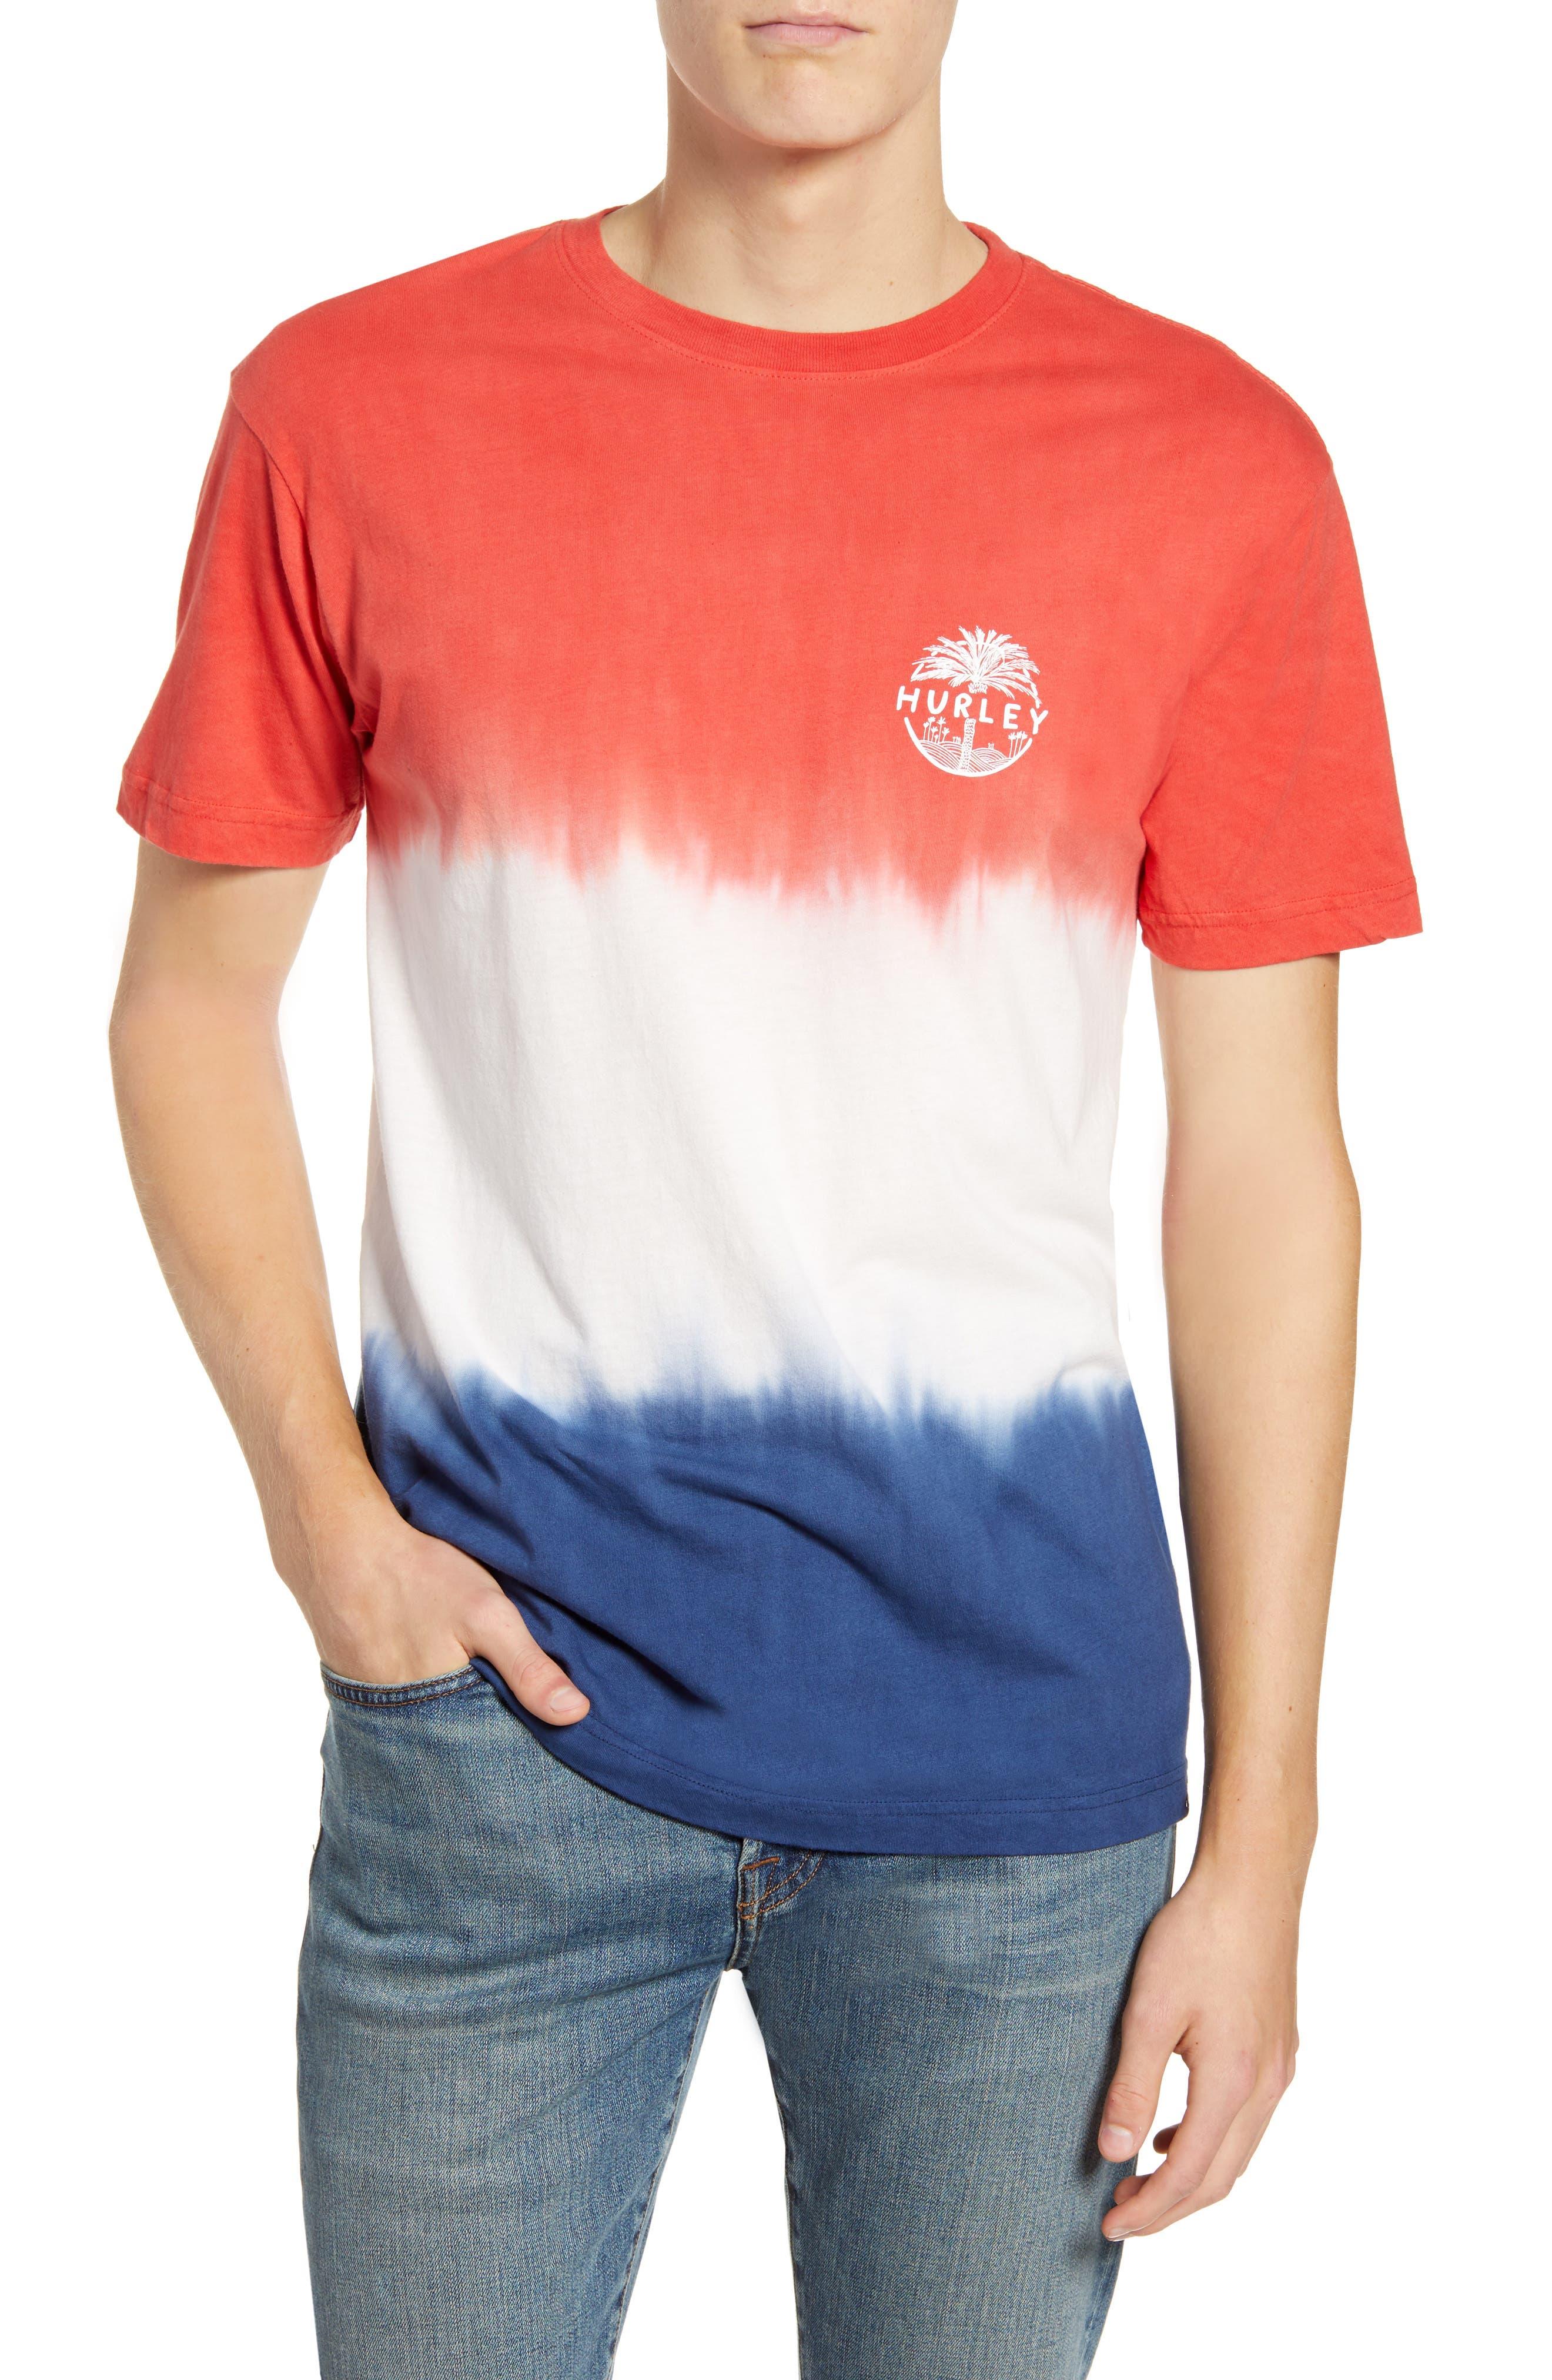 Hurley Usa Palmer Tie Dye T-Shirt, Red